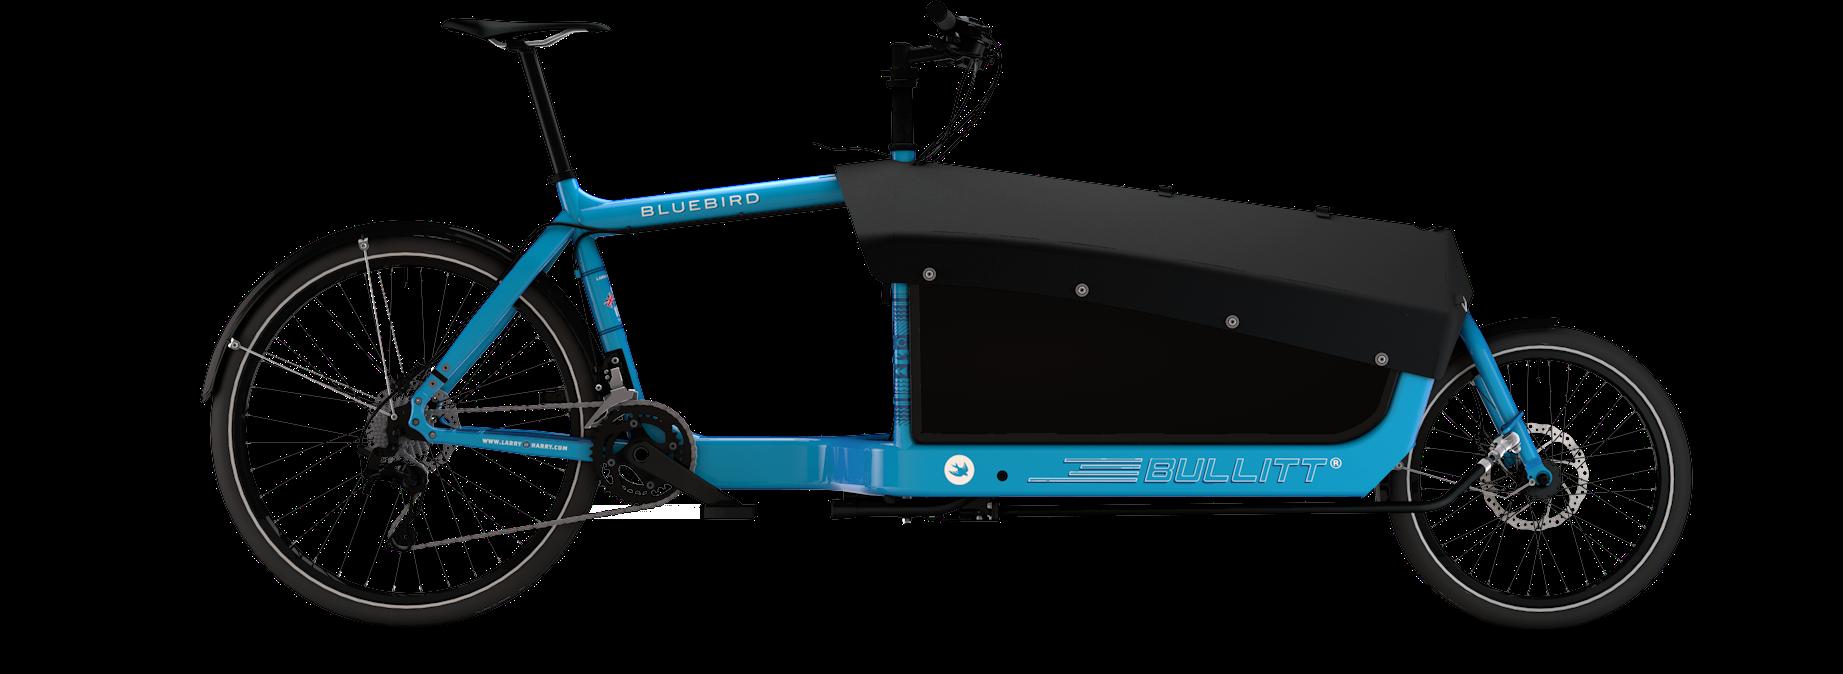 Ladcykel 2 hjul